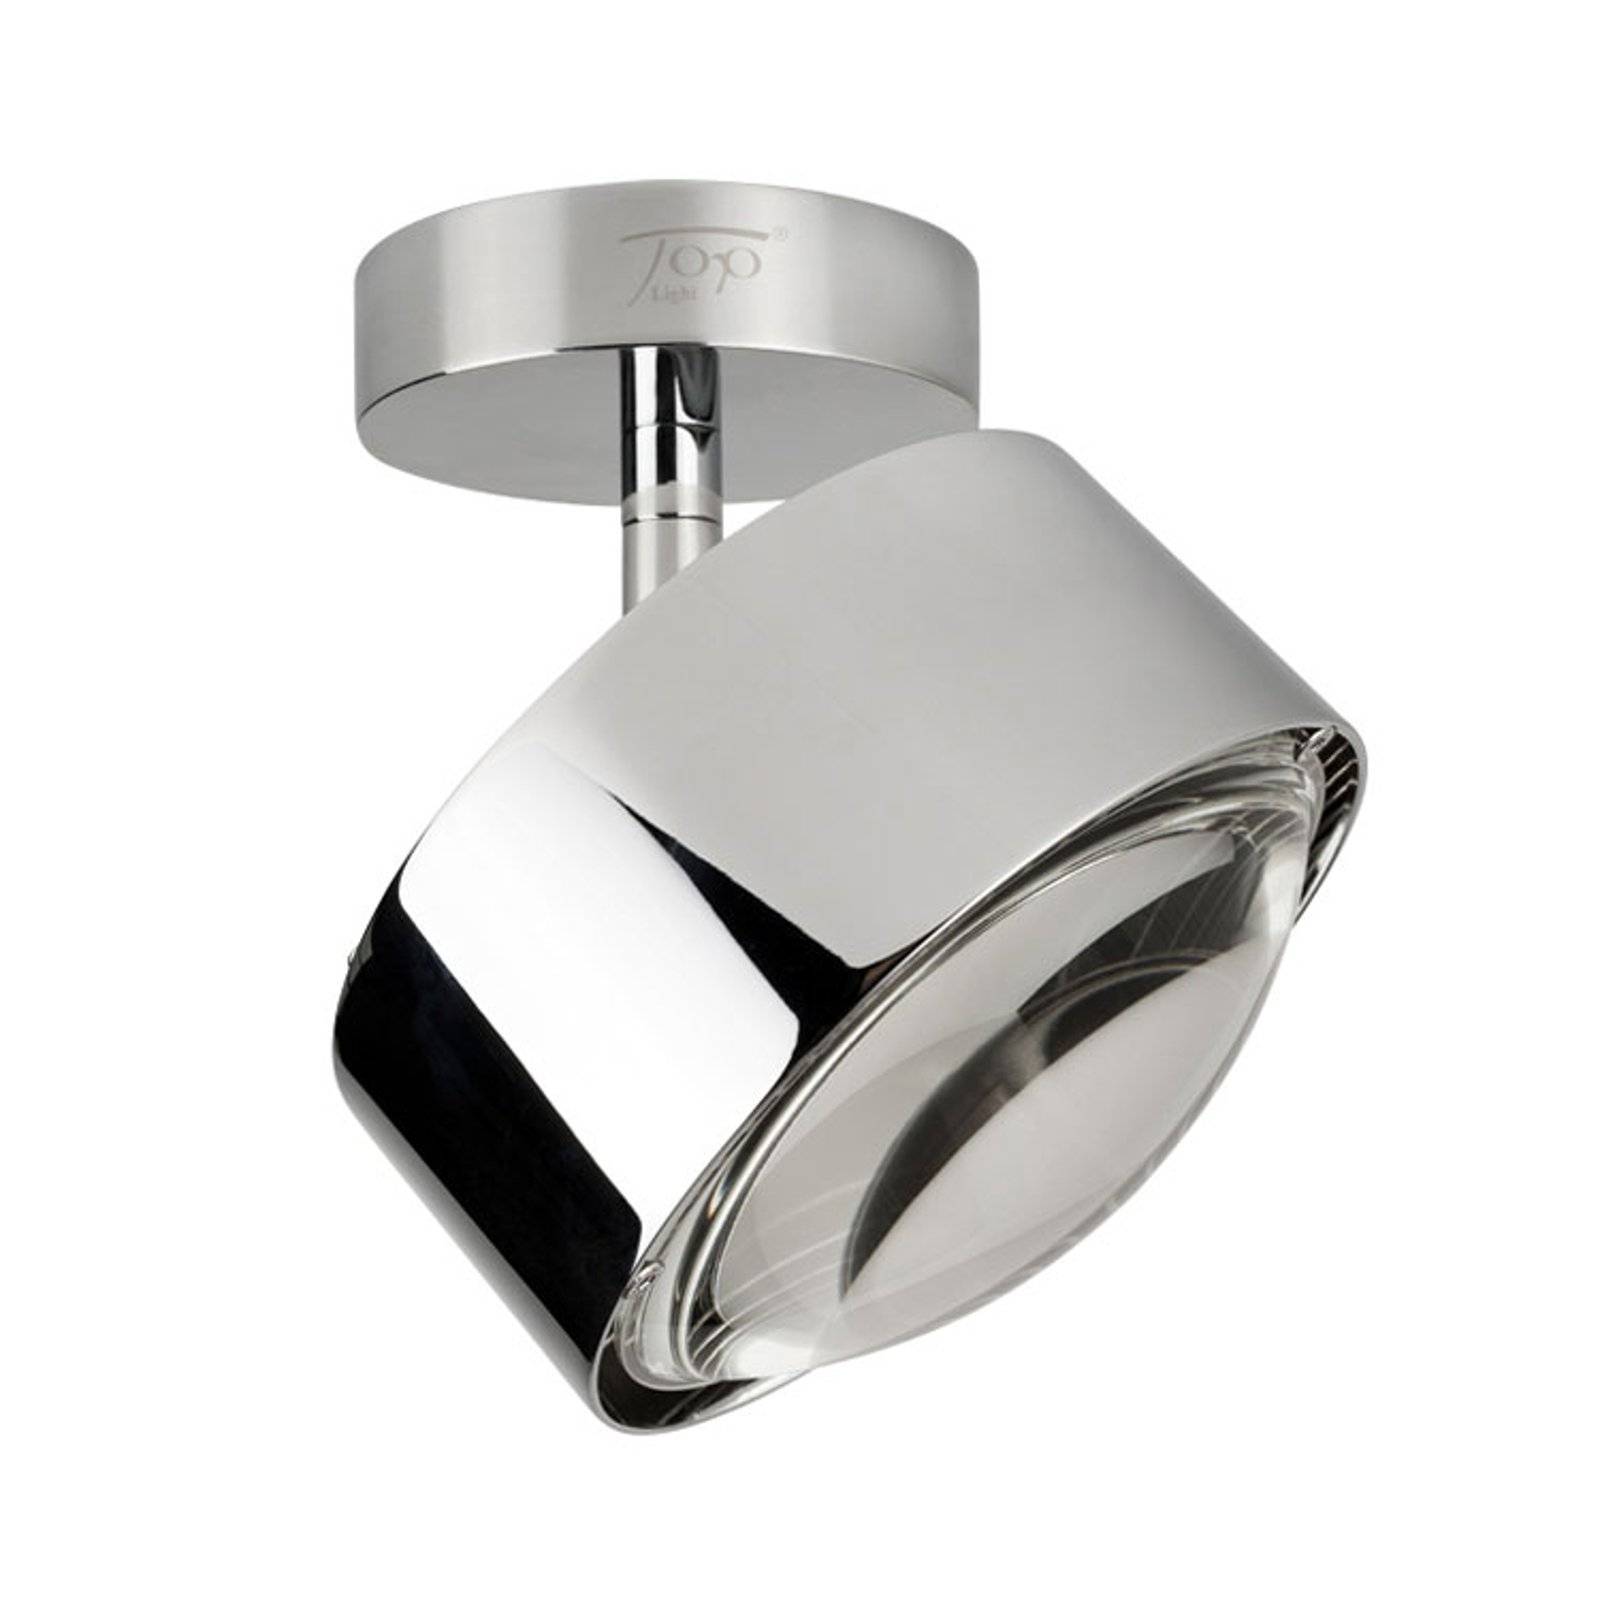 LED-vegglampe Puk Maxx Turn, krom